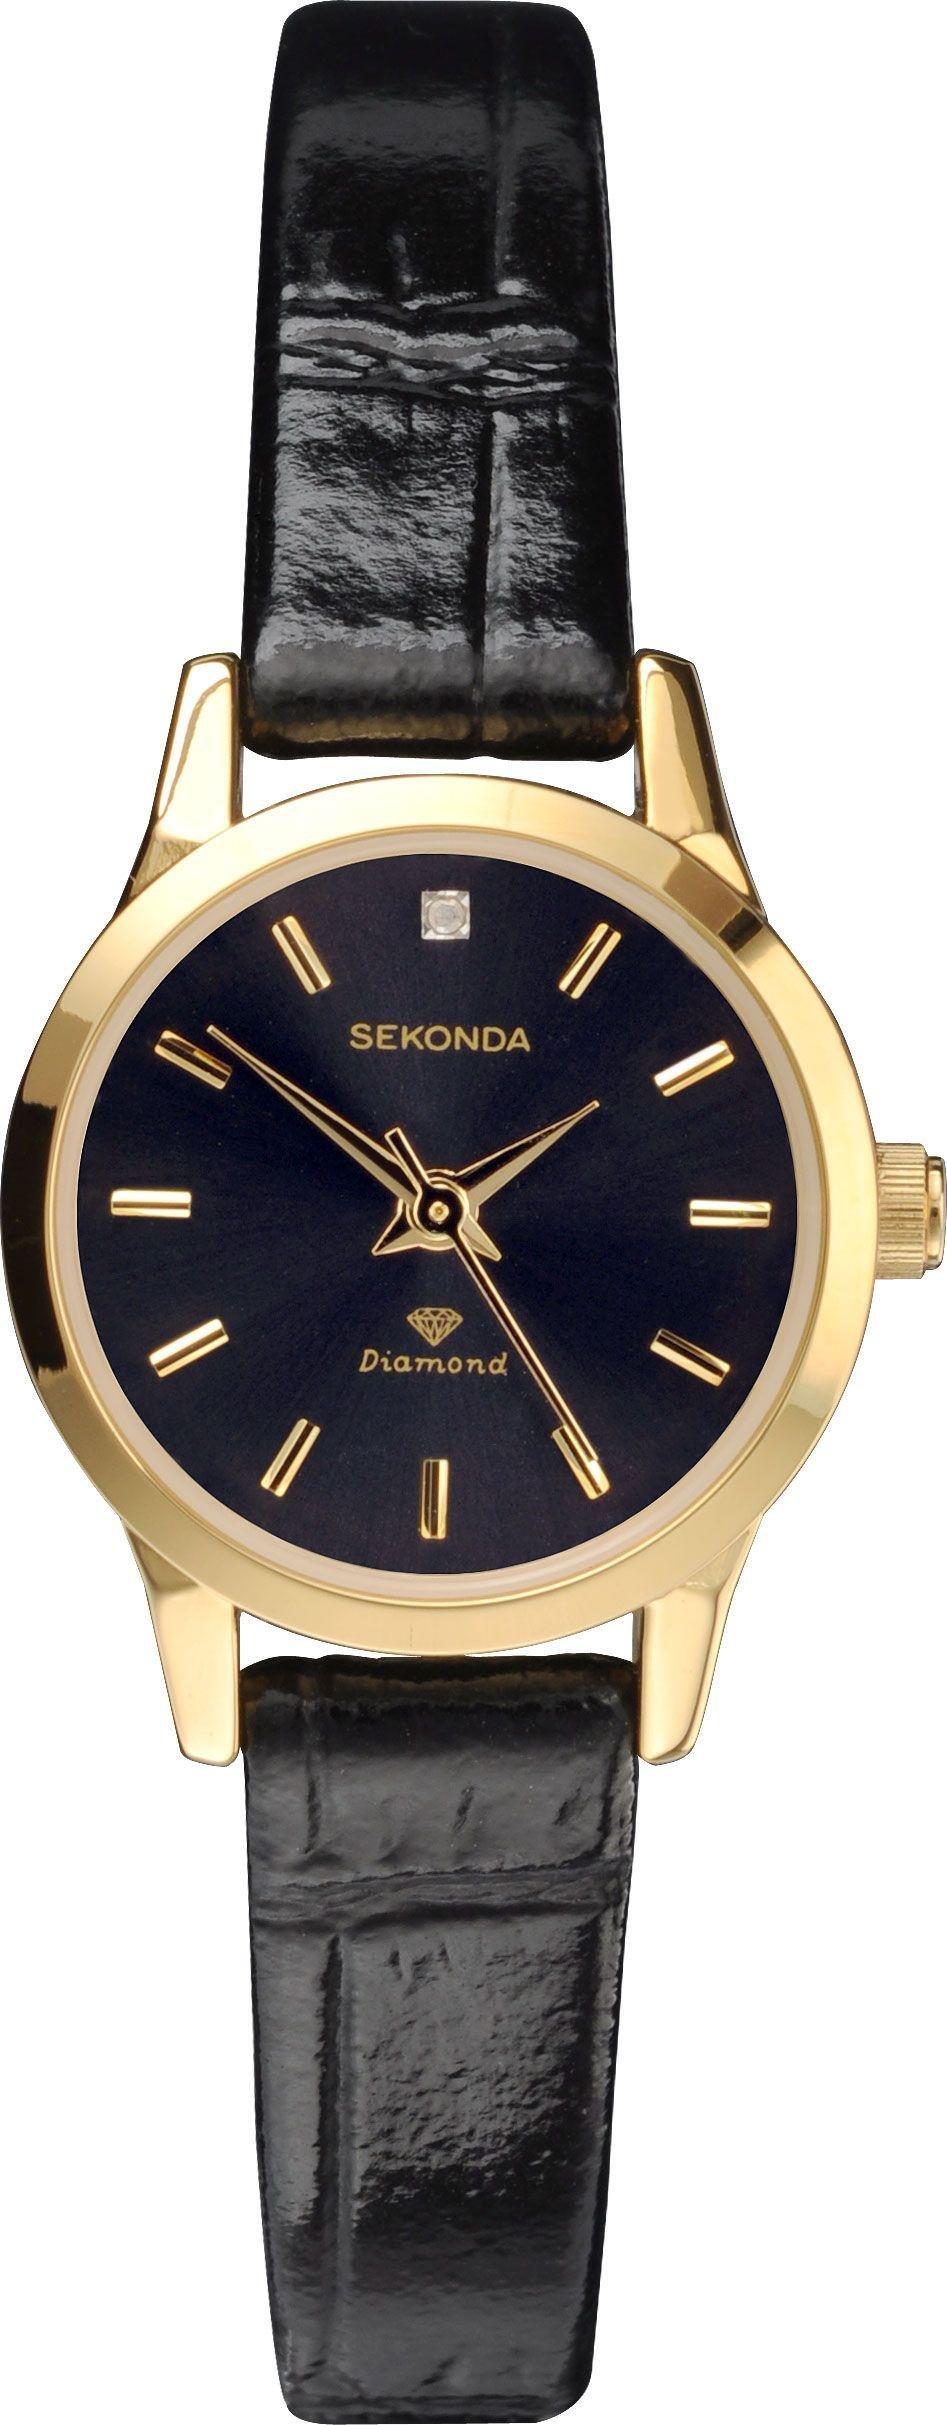 Sekonda Ladies Diamond Black Strap Watch